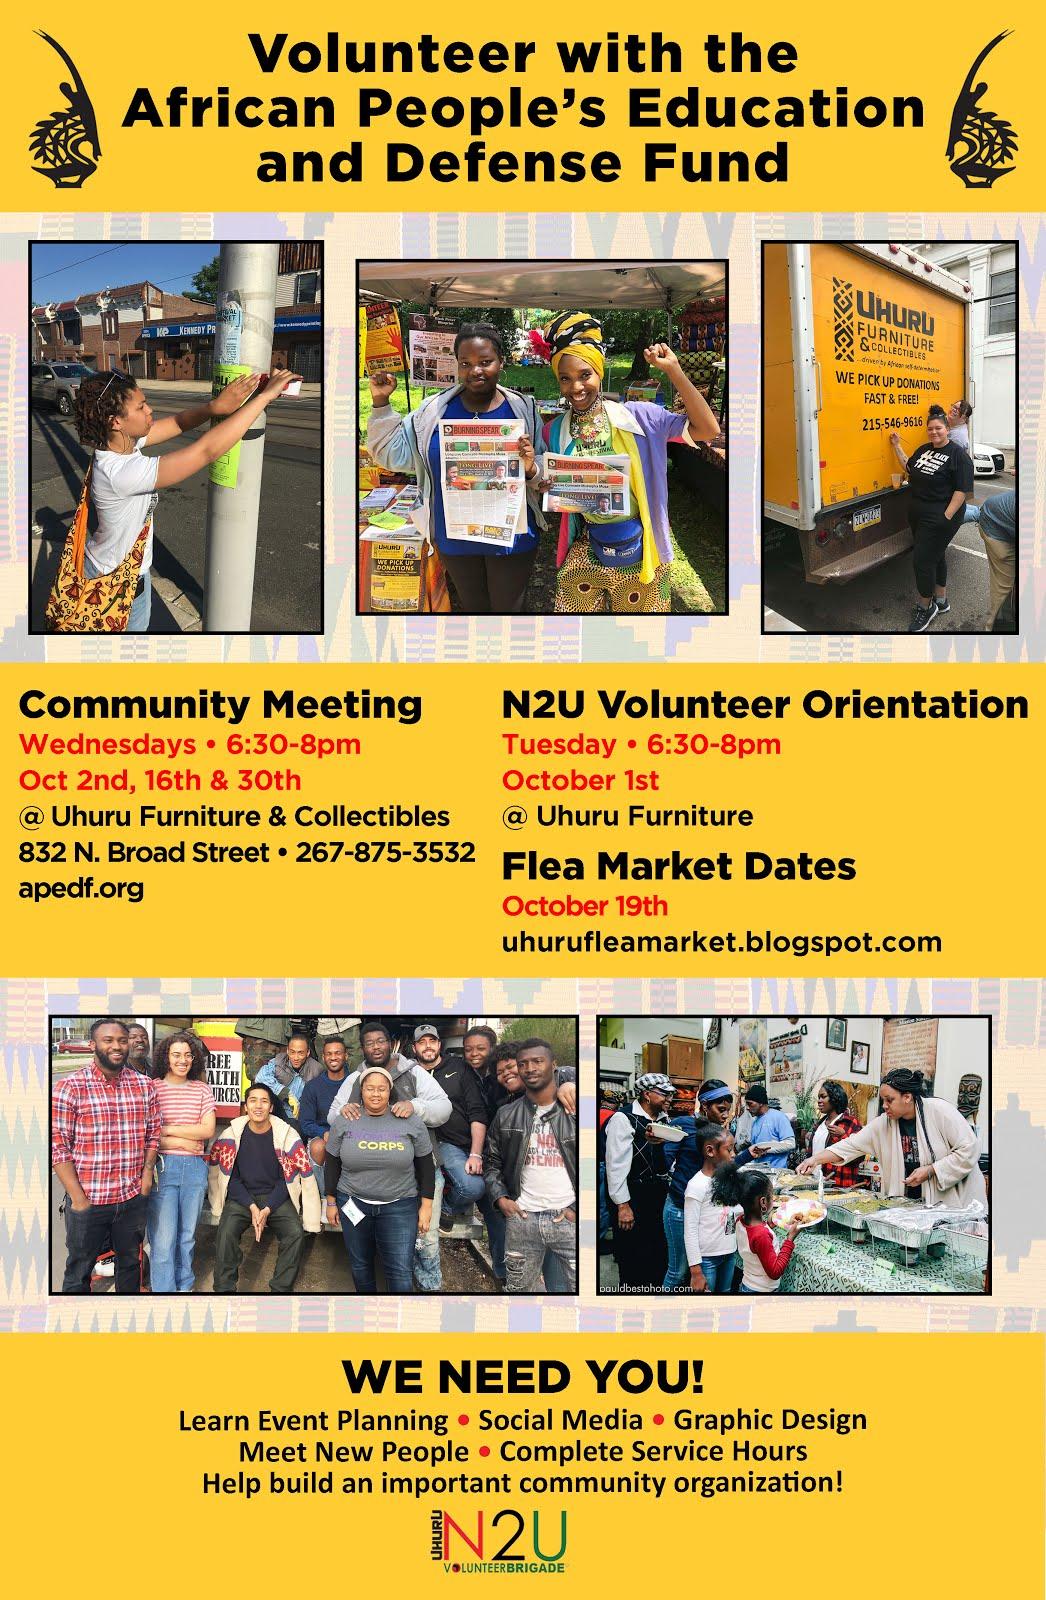 APEDF Community Meeting Schedule for October